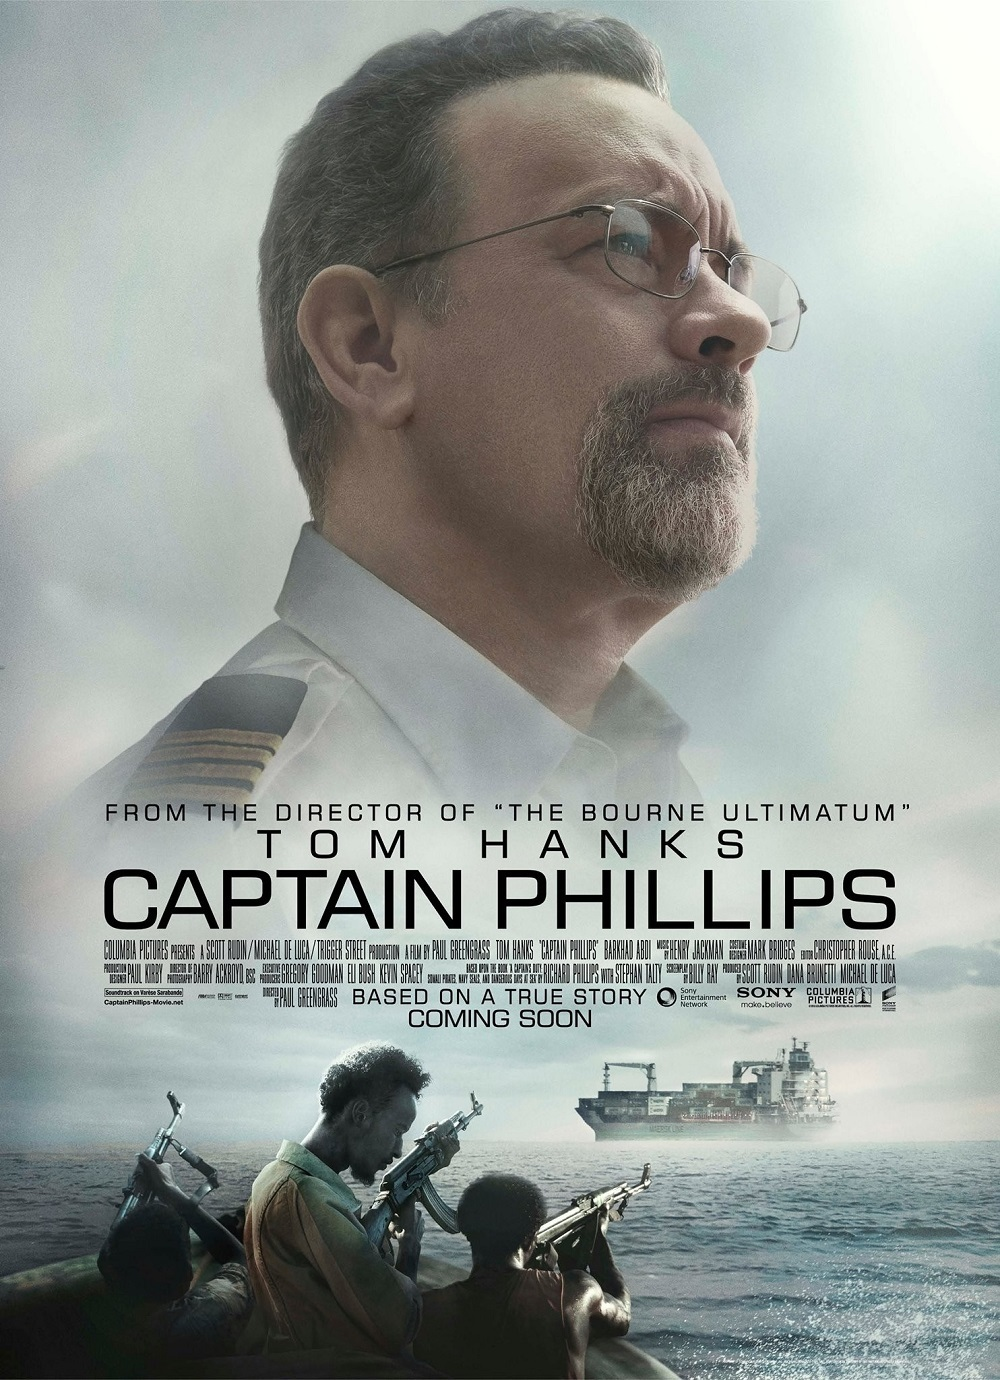 Captain Phillips DVD Release Date | Redbox, Netflix ...